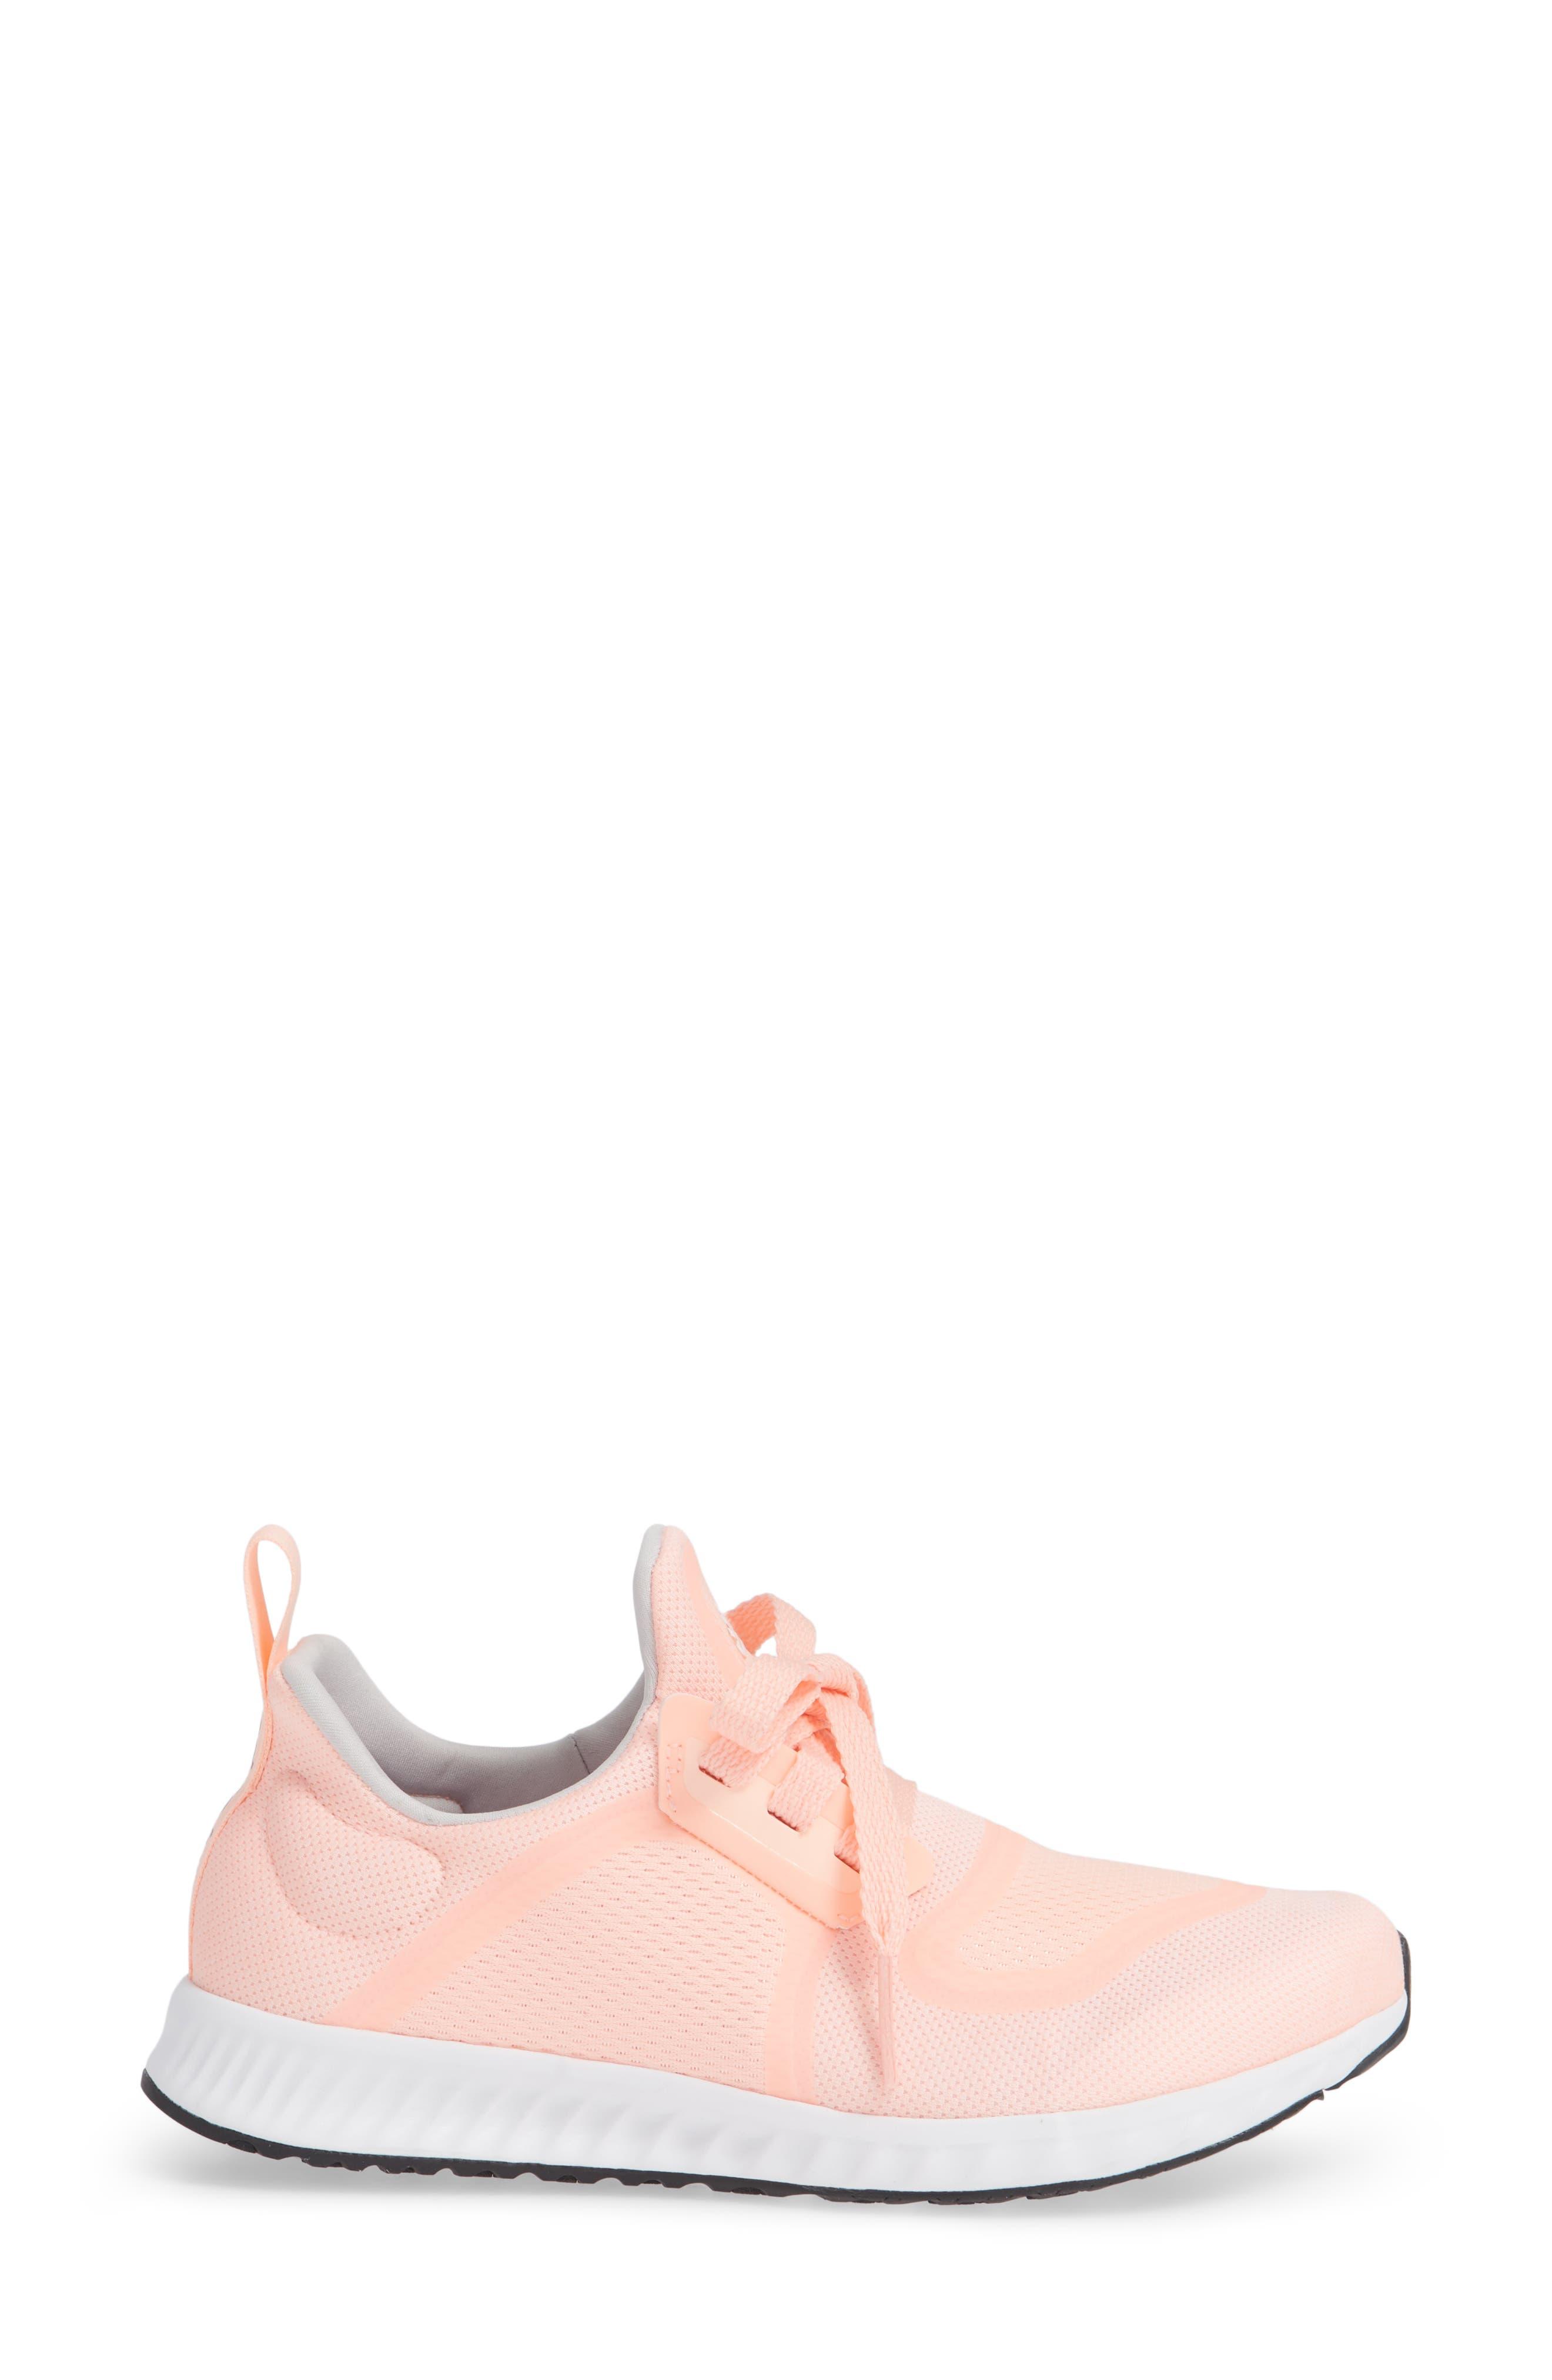 Edge Lux Clima Running Shoe,                             Alternate thumbnail 3, color,                             Clear Orange/ White